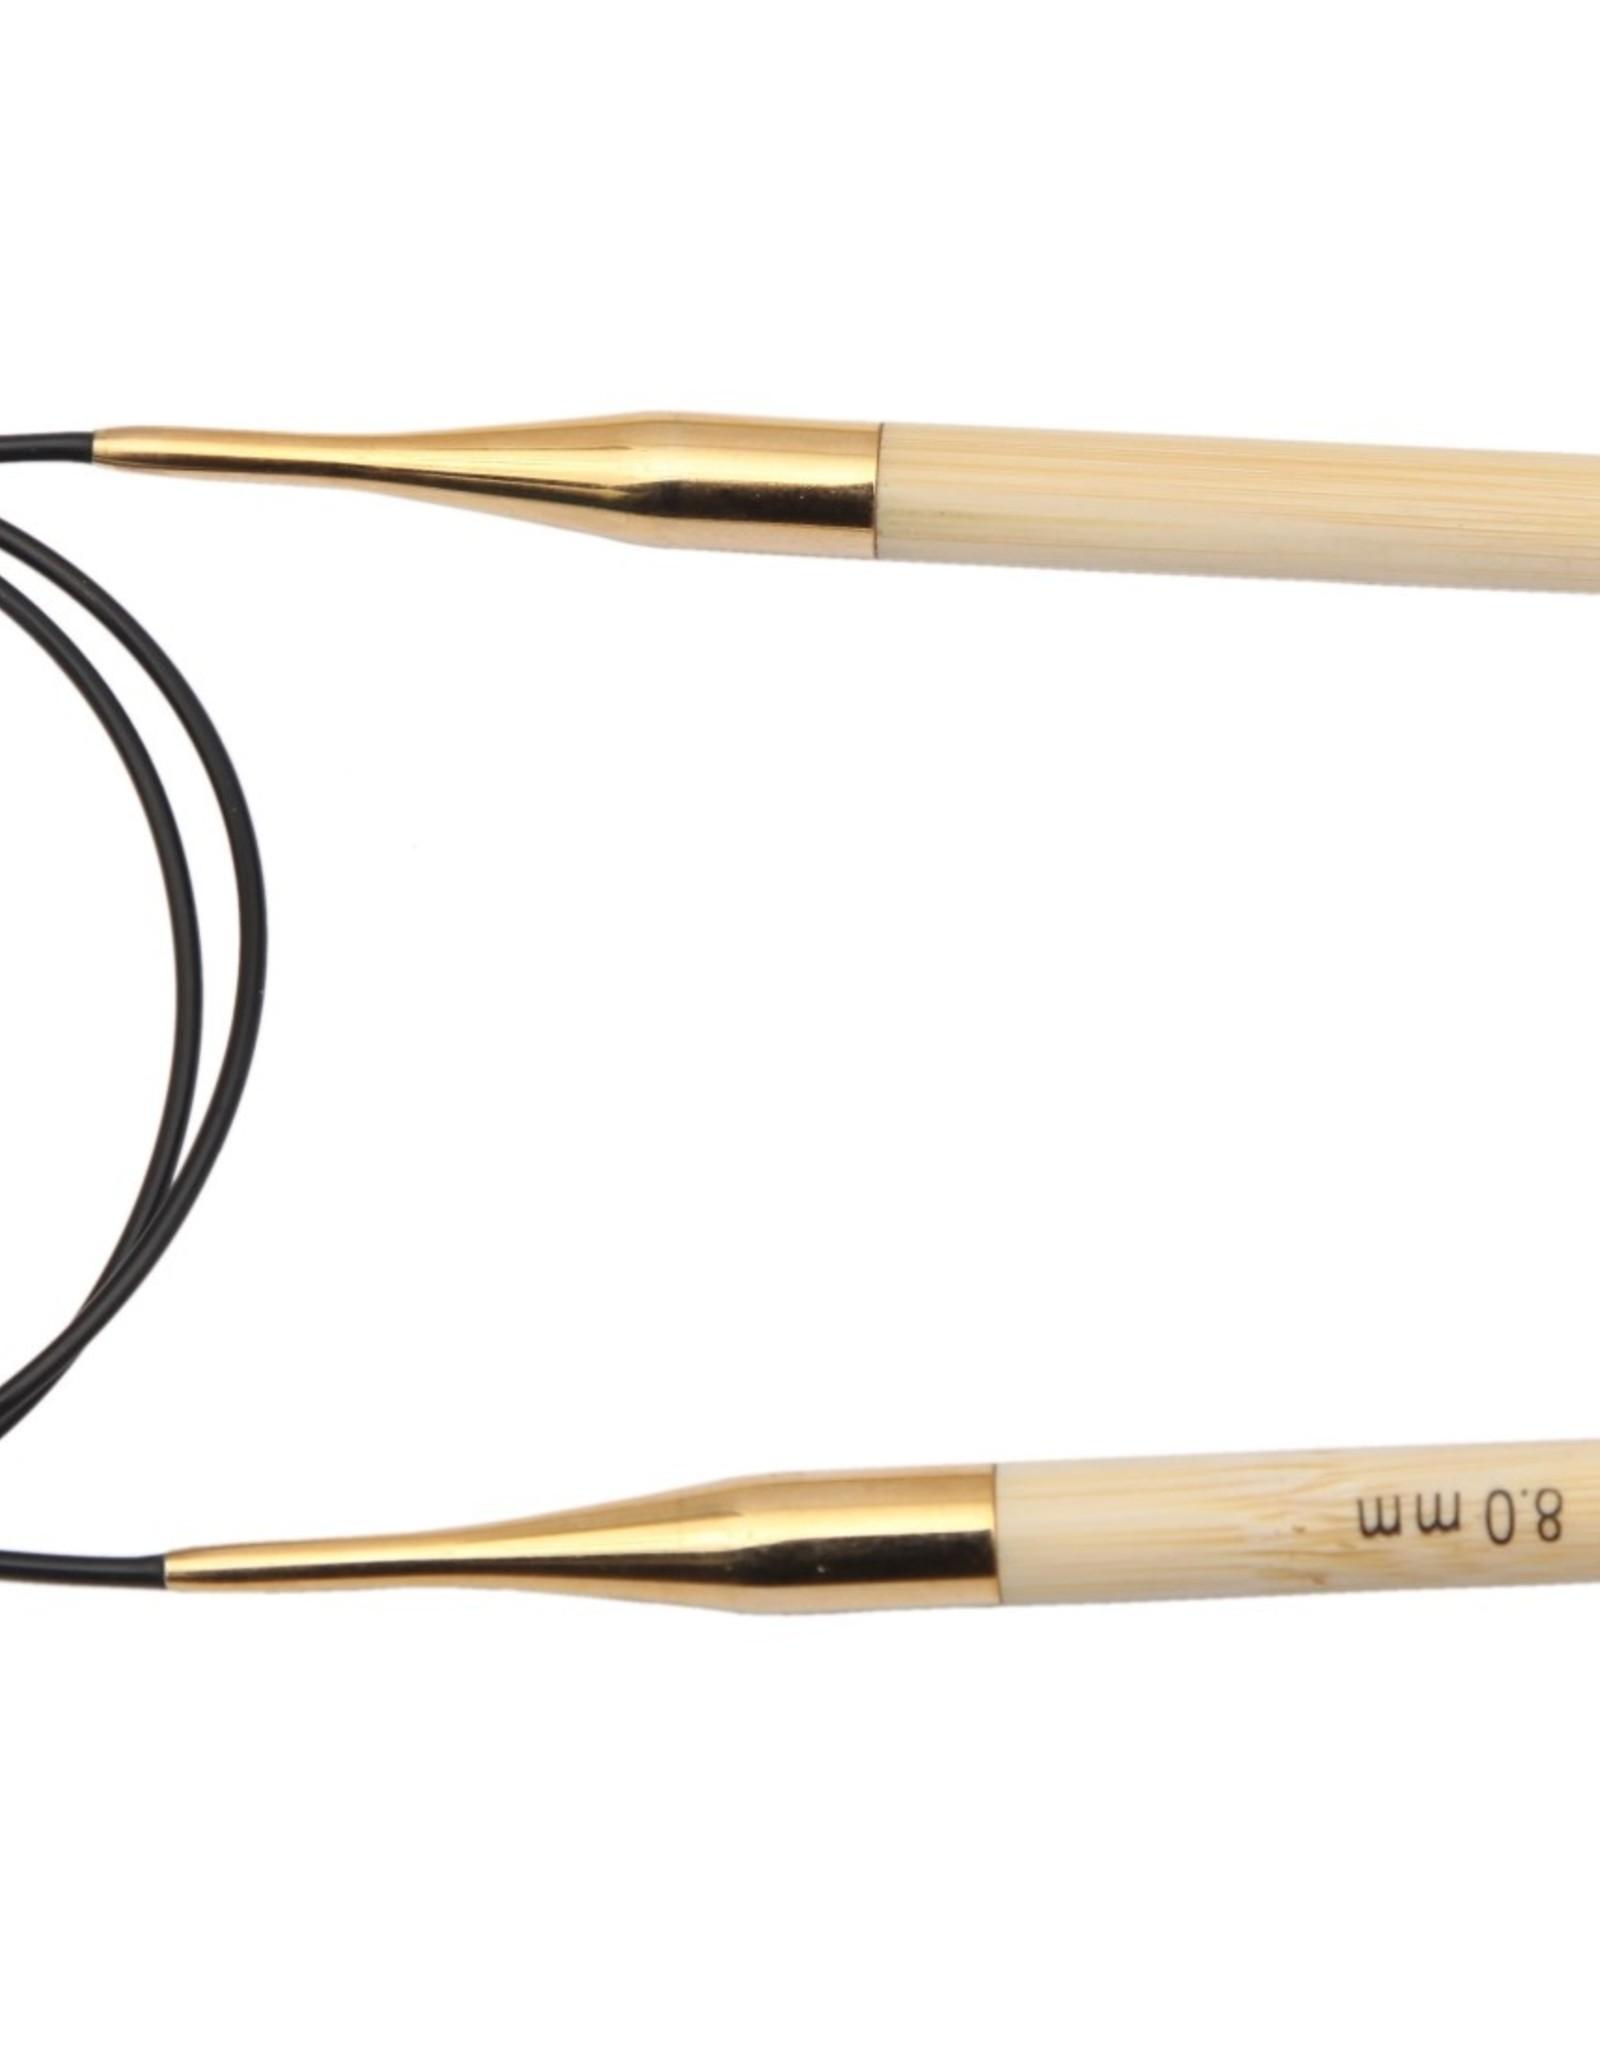 "Knitters Pride Bamboo Circular Needles 32"" (80cm)"